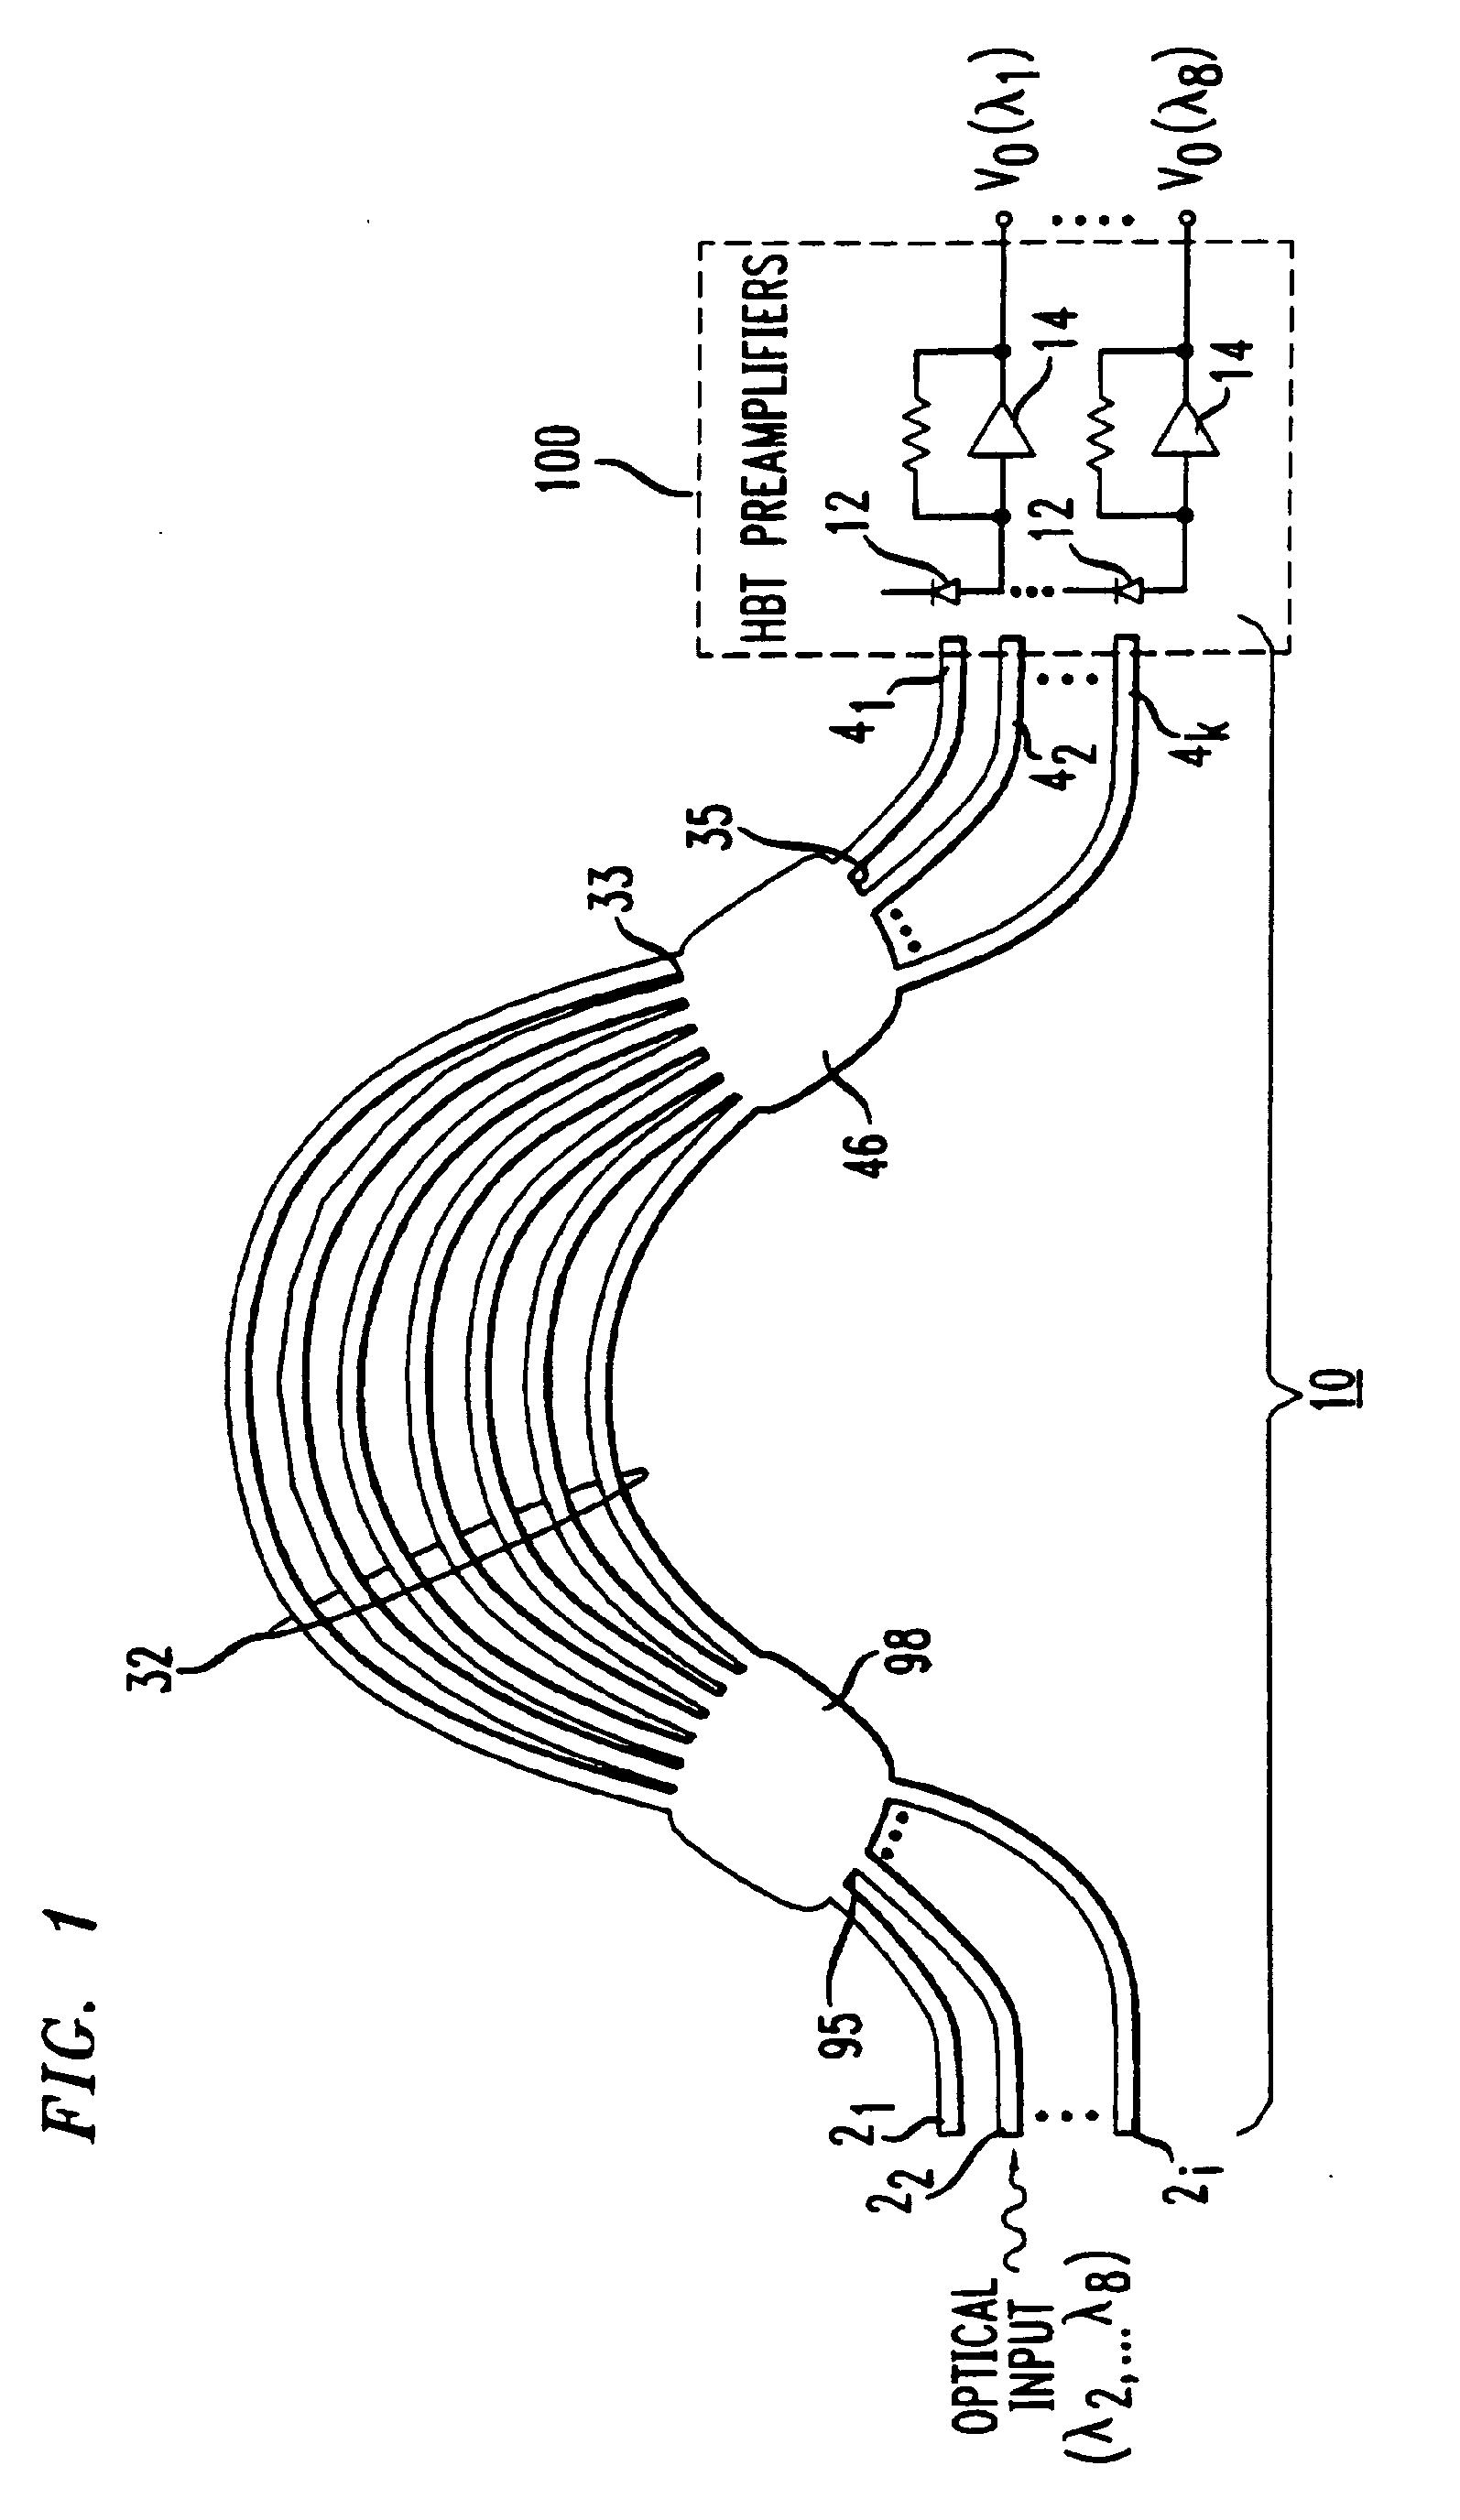 patent ep0758799b1  ingaas monolithic integrated